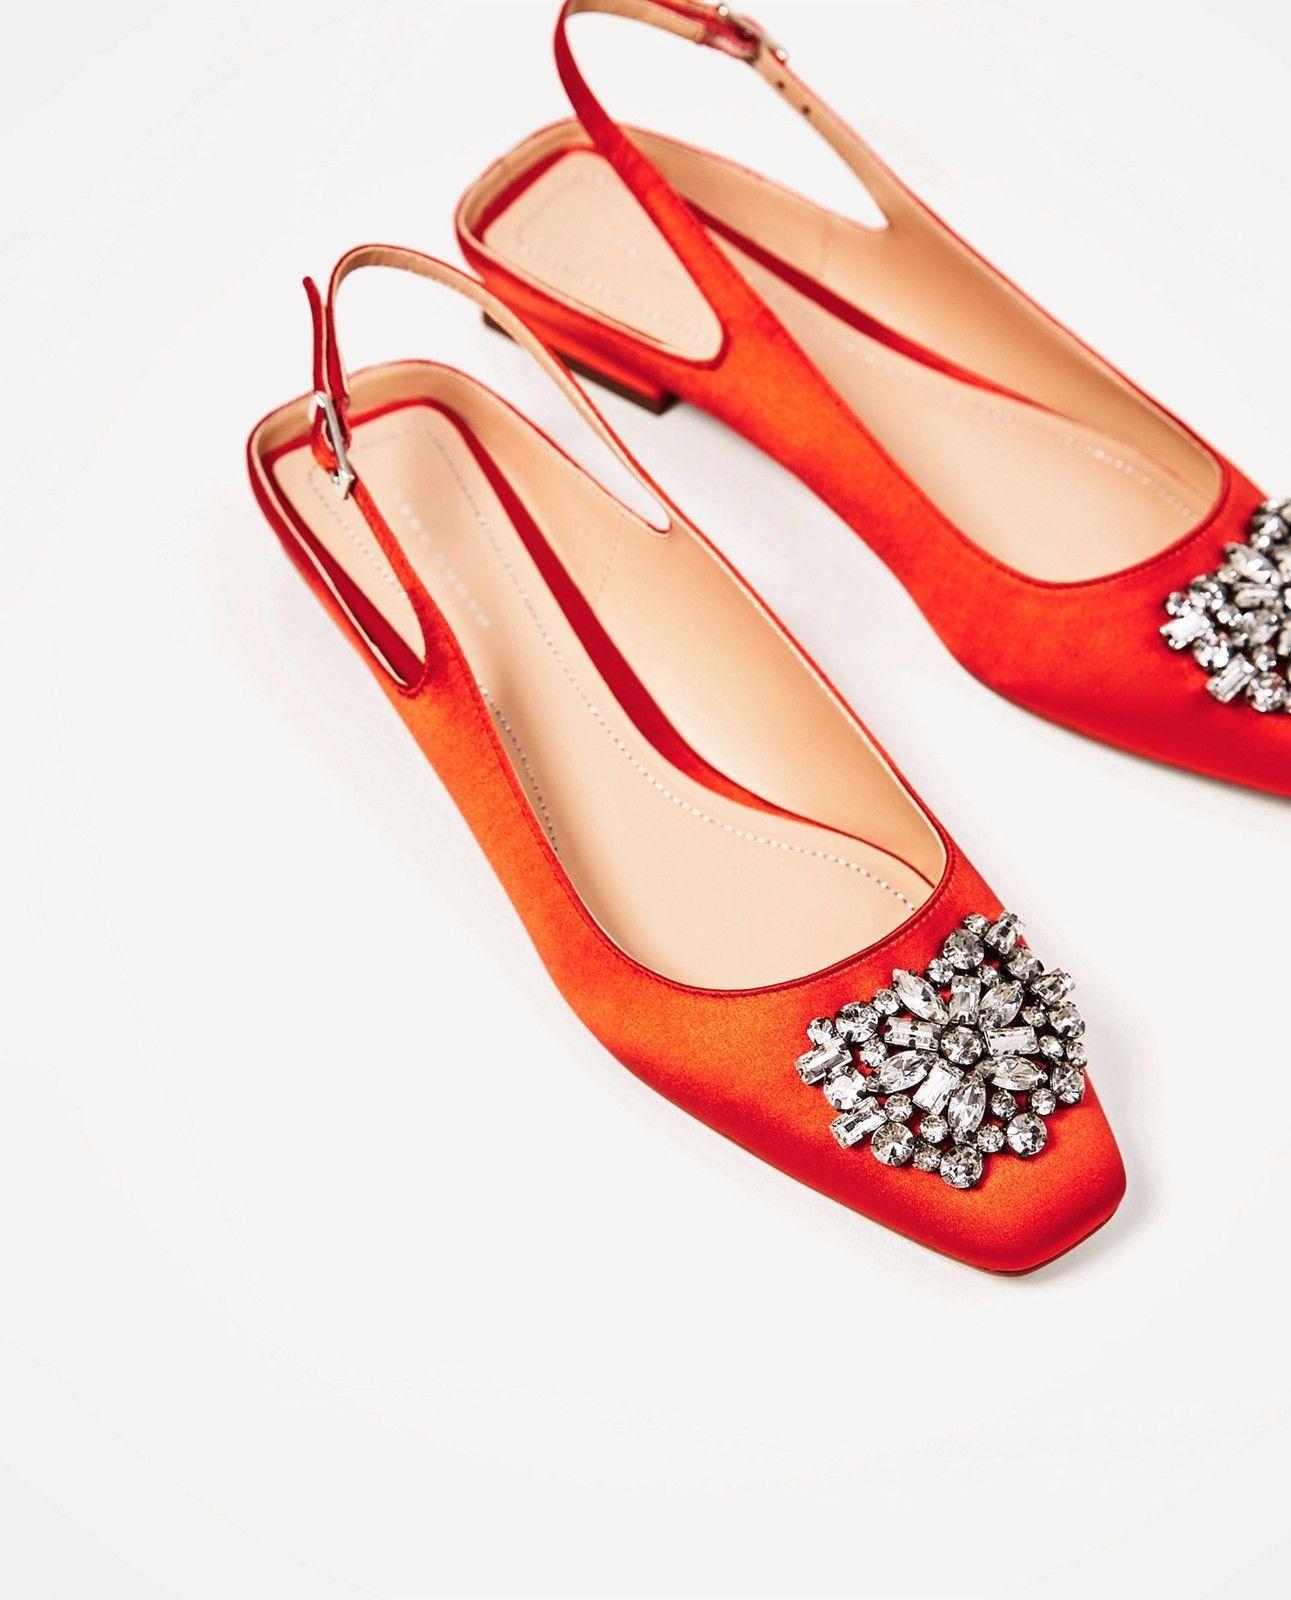 cfe53a7adc8 Zara Ss17 Flat Slingback Shoes With Beaded Detail Orange 1352 201 ...